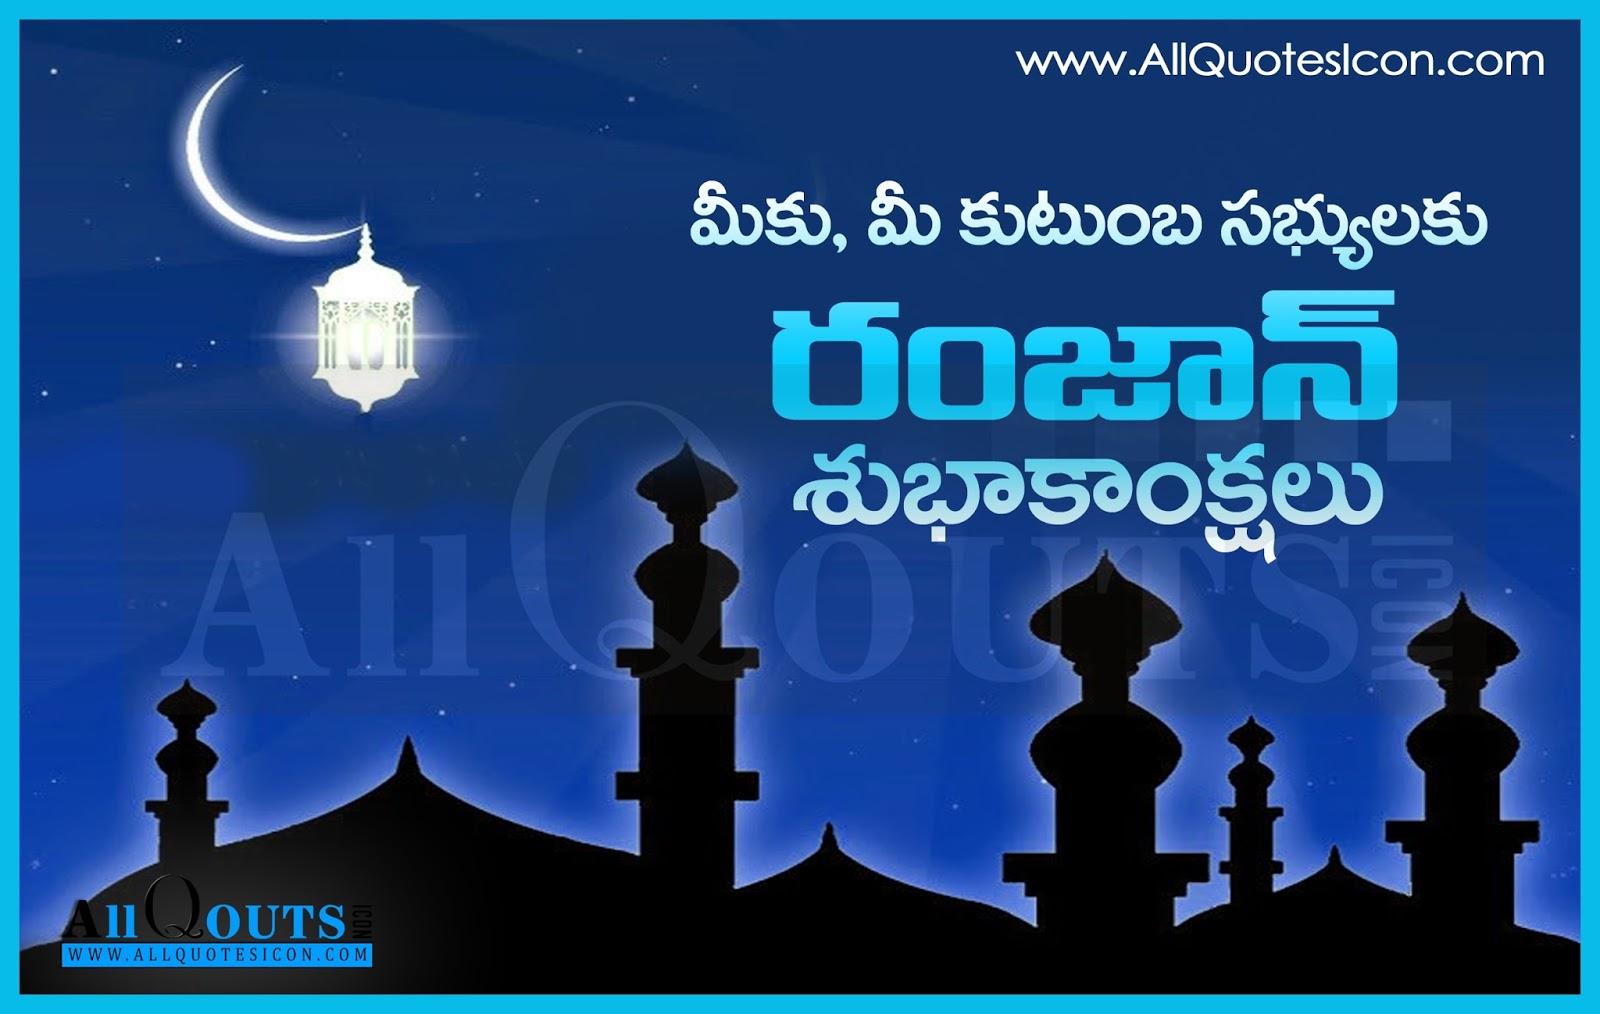 Ramadan greetings in telugu wallpapers best happy ramadan mubarak english quotes images ramadan pictures wallpapers mubarack wishes kristyandbryce Choice Image